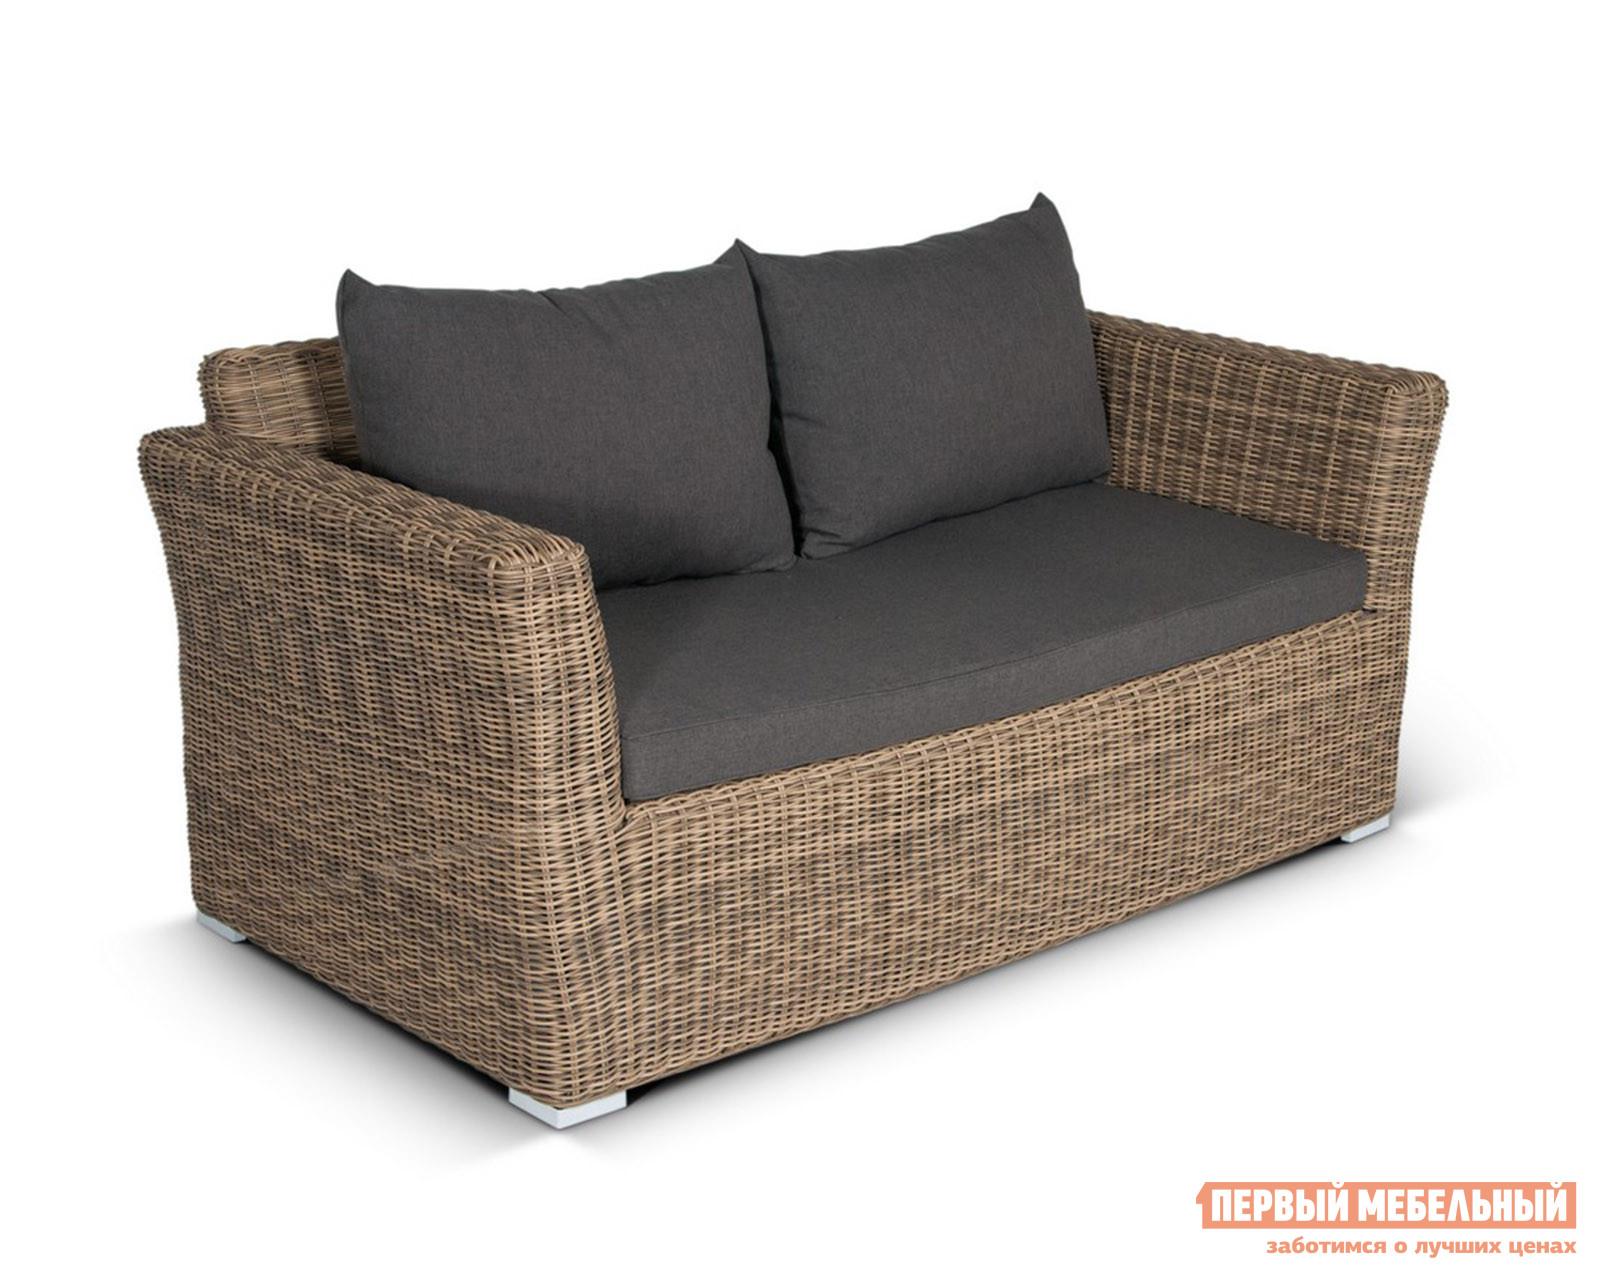 Плетеный диван Кватросис YH-C2130W-3 плетеный стол кватросис бергамо yh s4684p 2